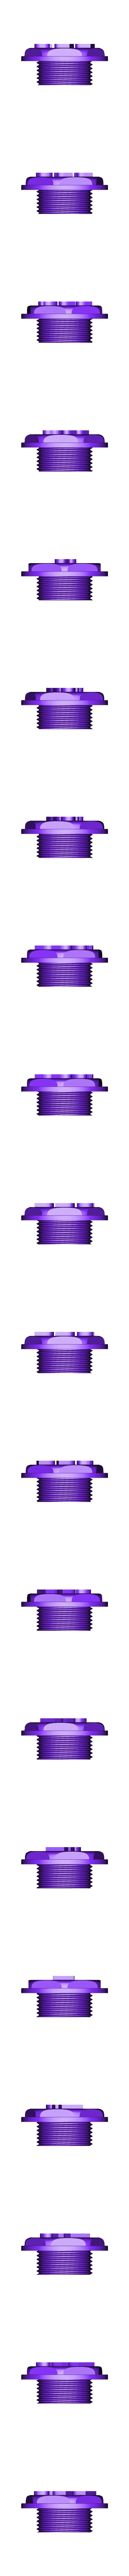 grey_screw_text.stl Download STL file BBS RS model • 3D printable template, bedezeu